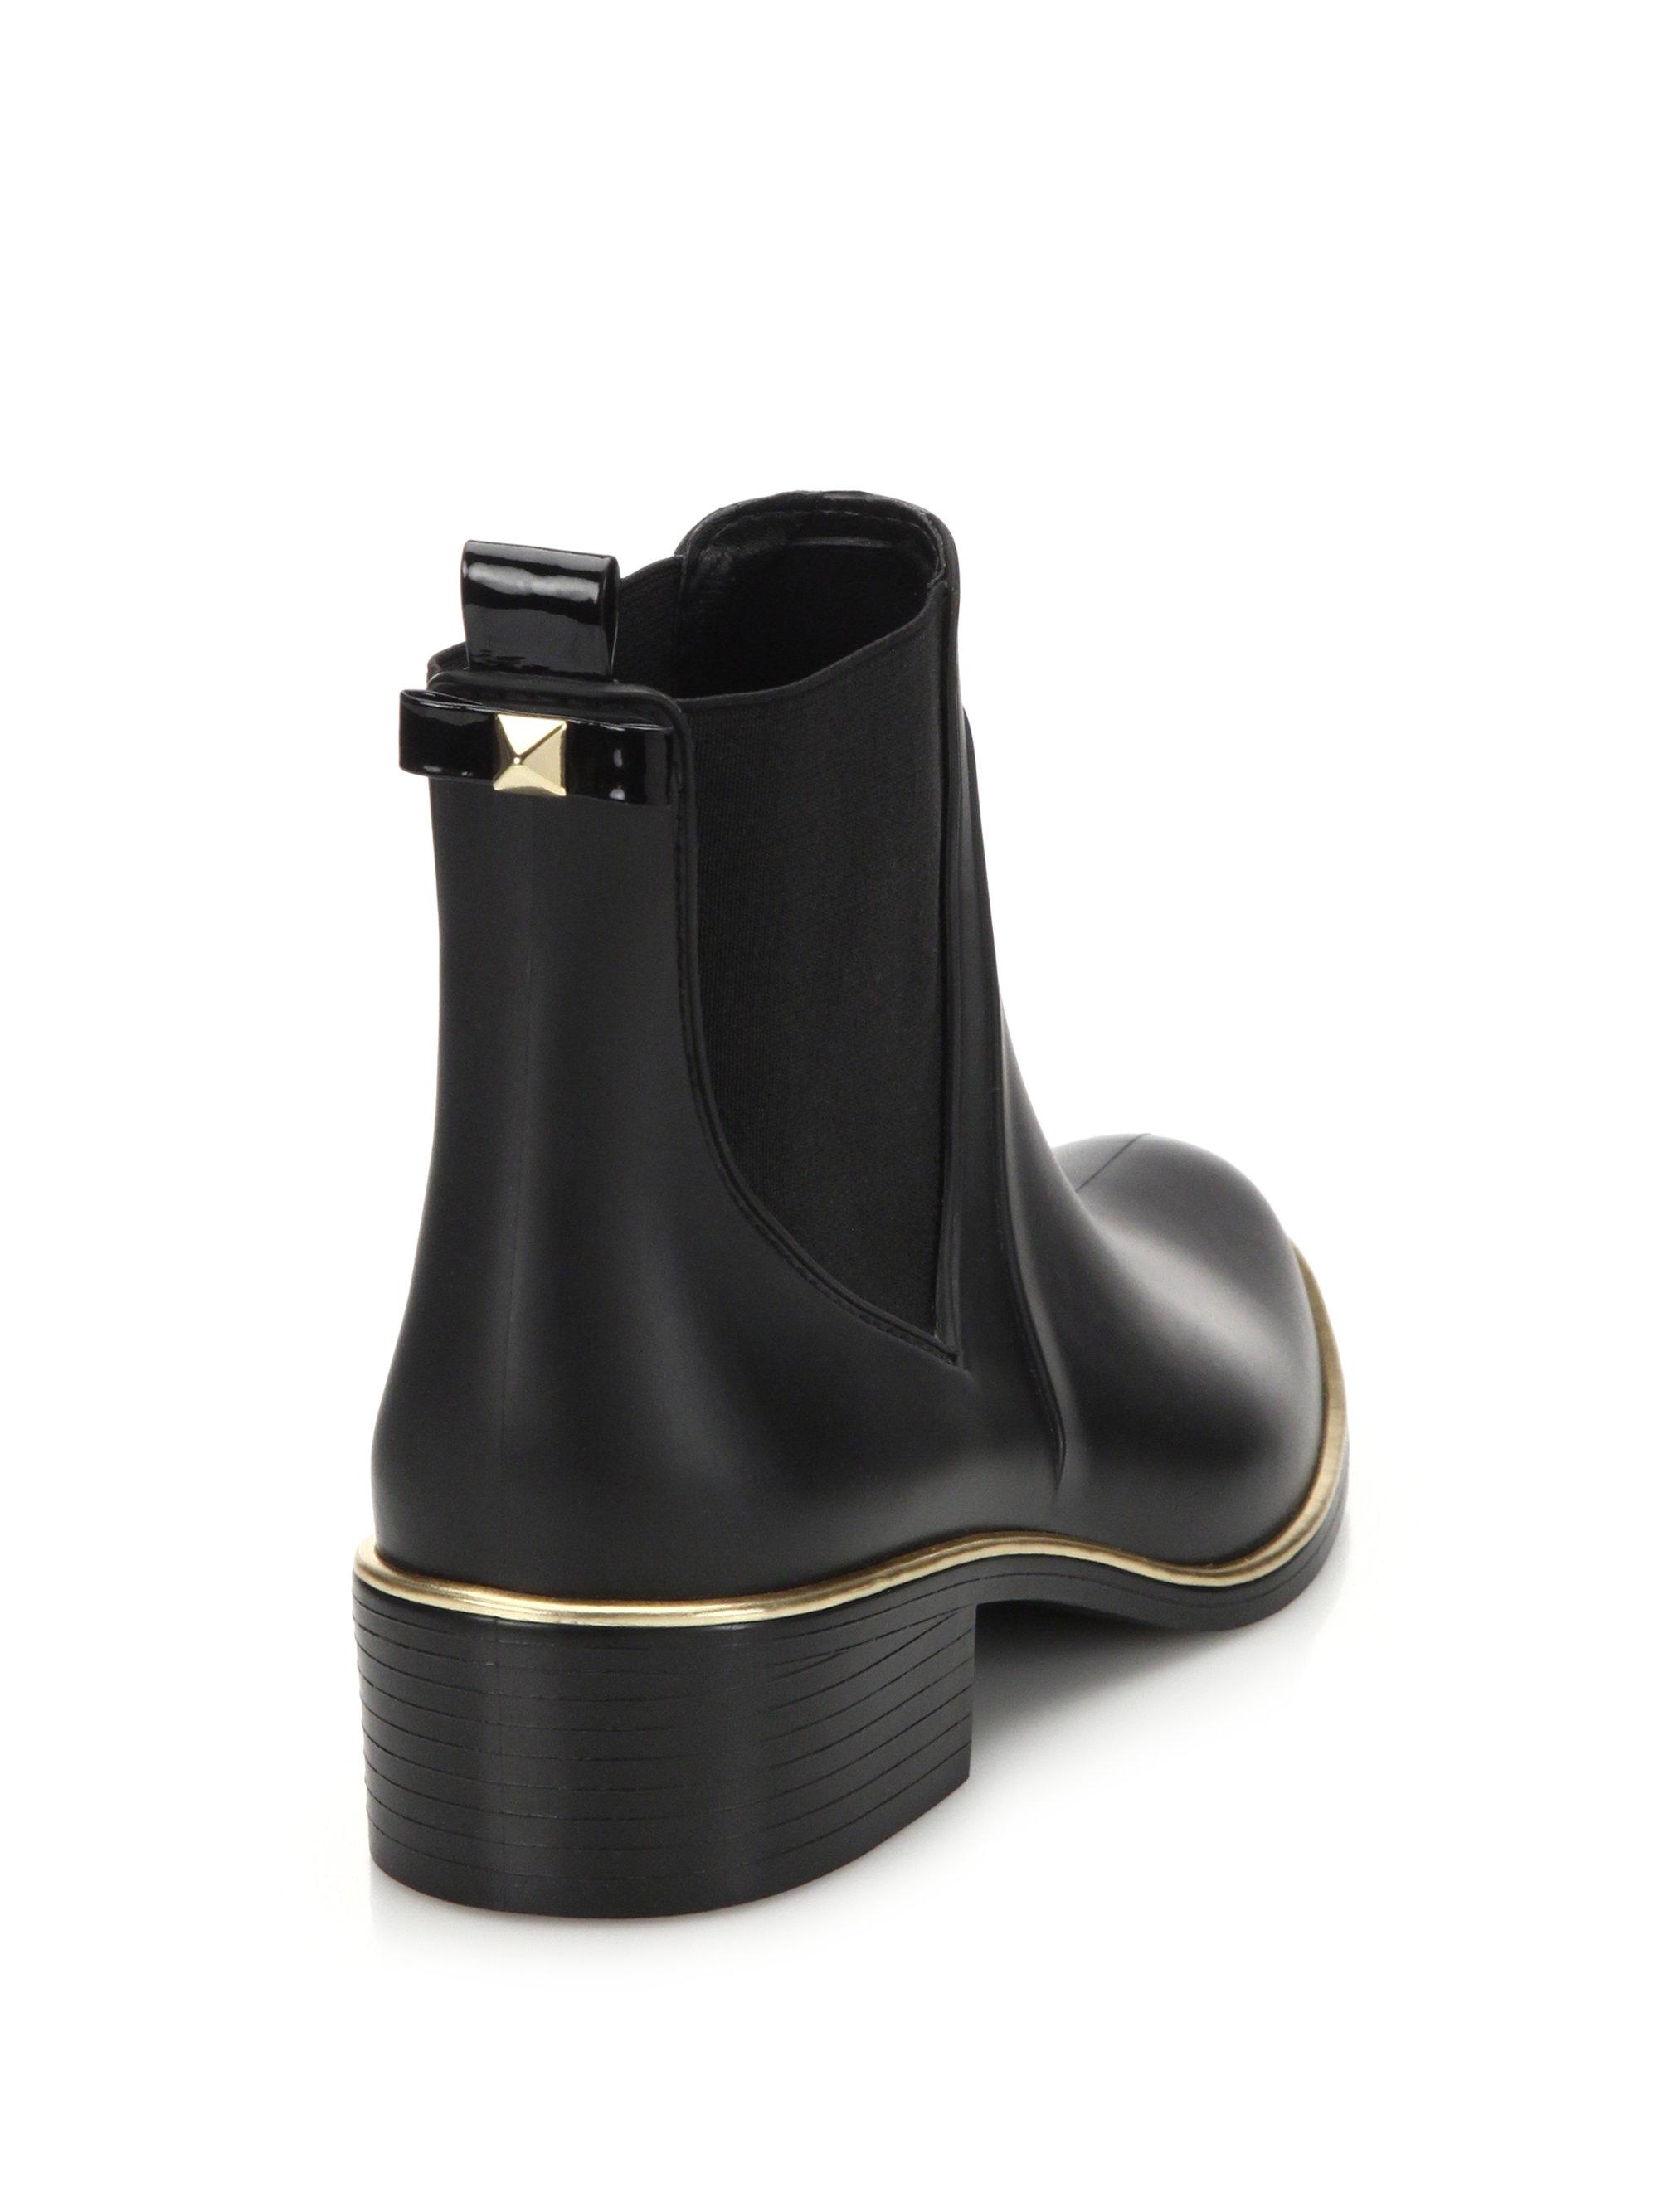 Kate Spade Sedgewick Rubber Chelsea Rainboots In Black - Lyst-5929